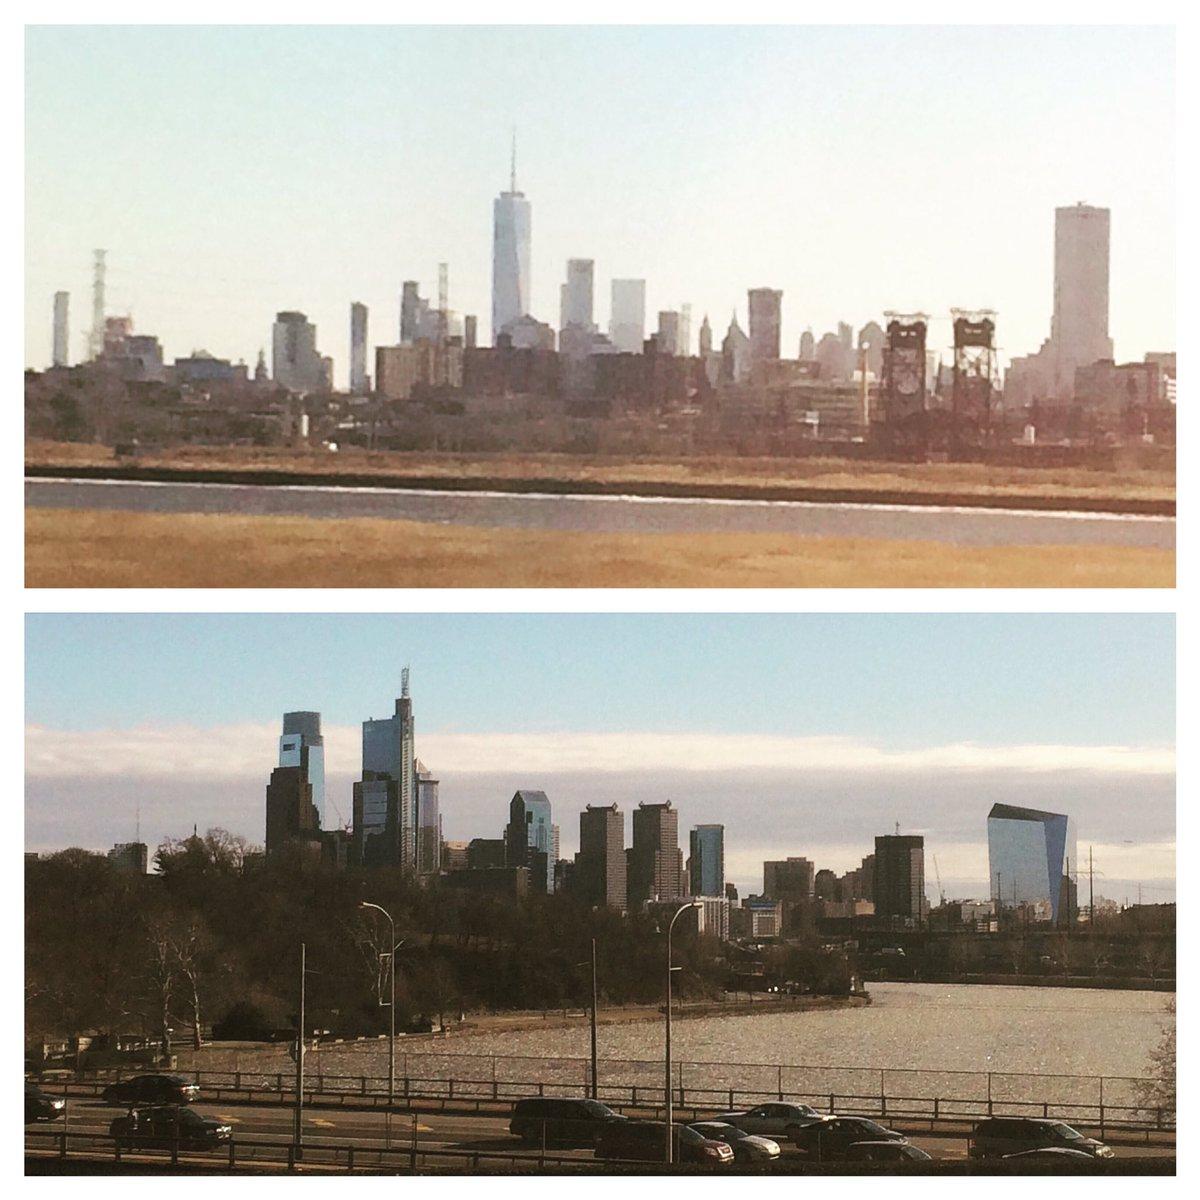 Why do all #skyline look alike ? #newyork #philadelphia #amtrak #acelaexpress #2251 🛤🚅🇺🇸 https://t.co/BQLBZ3f1cc